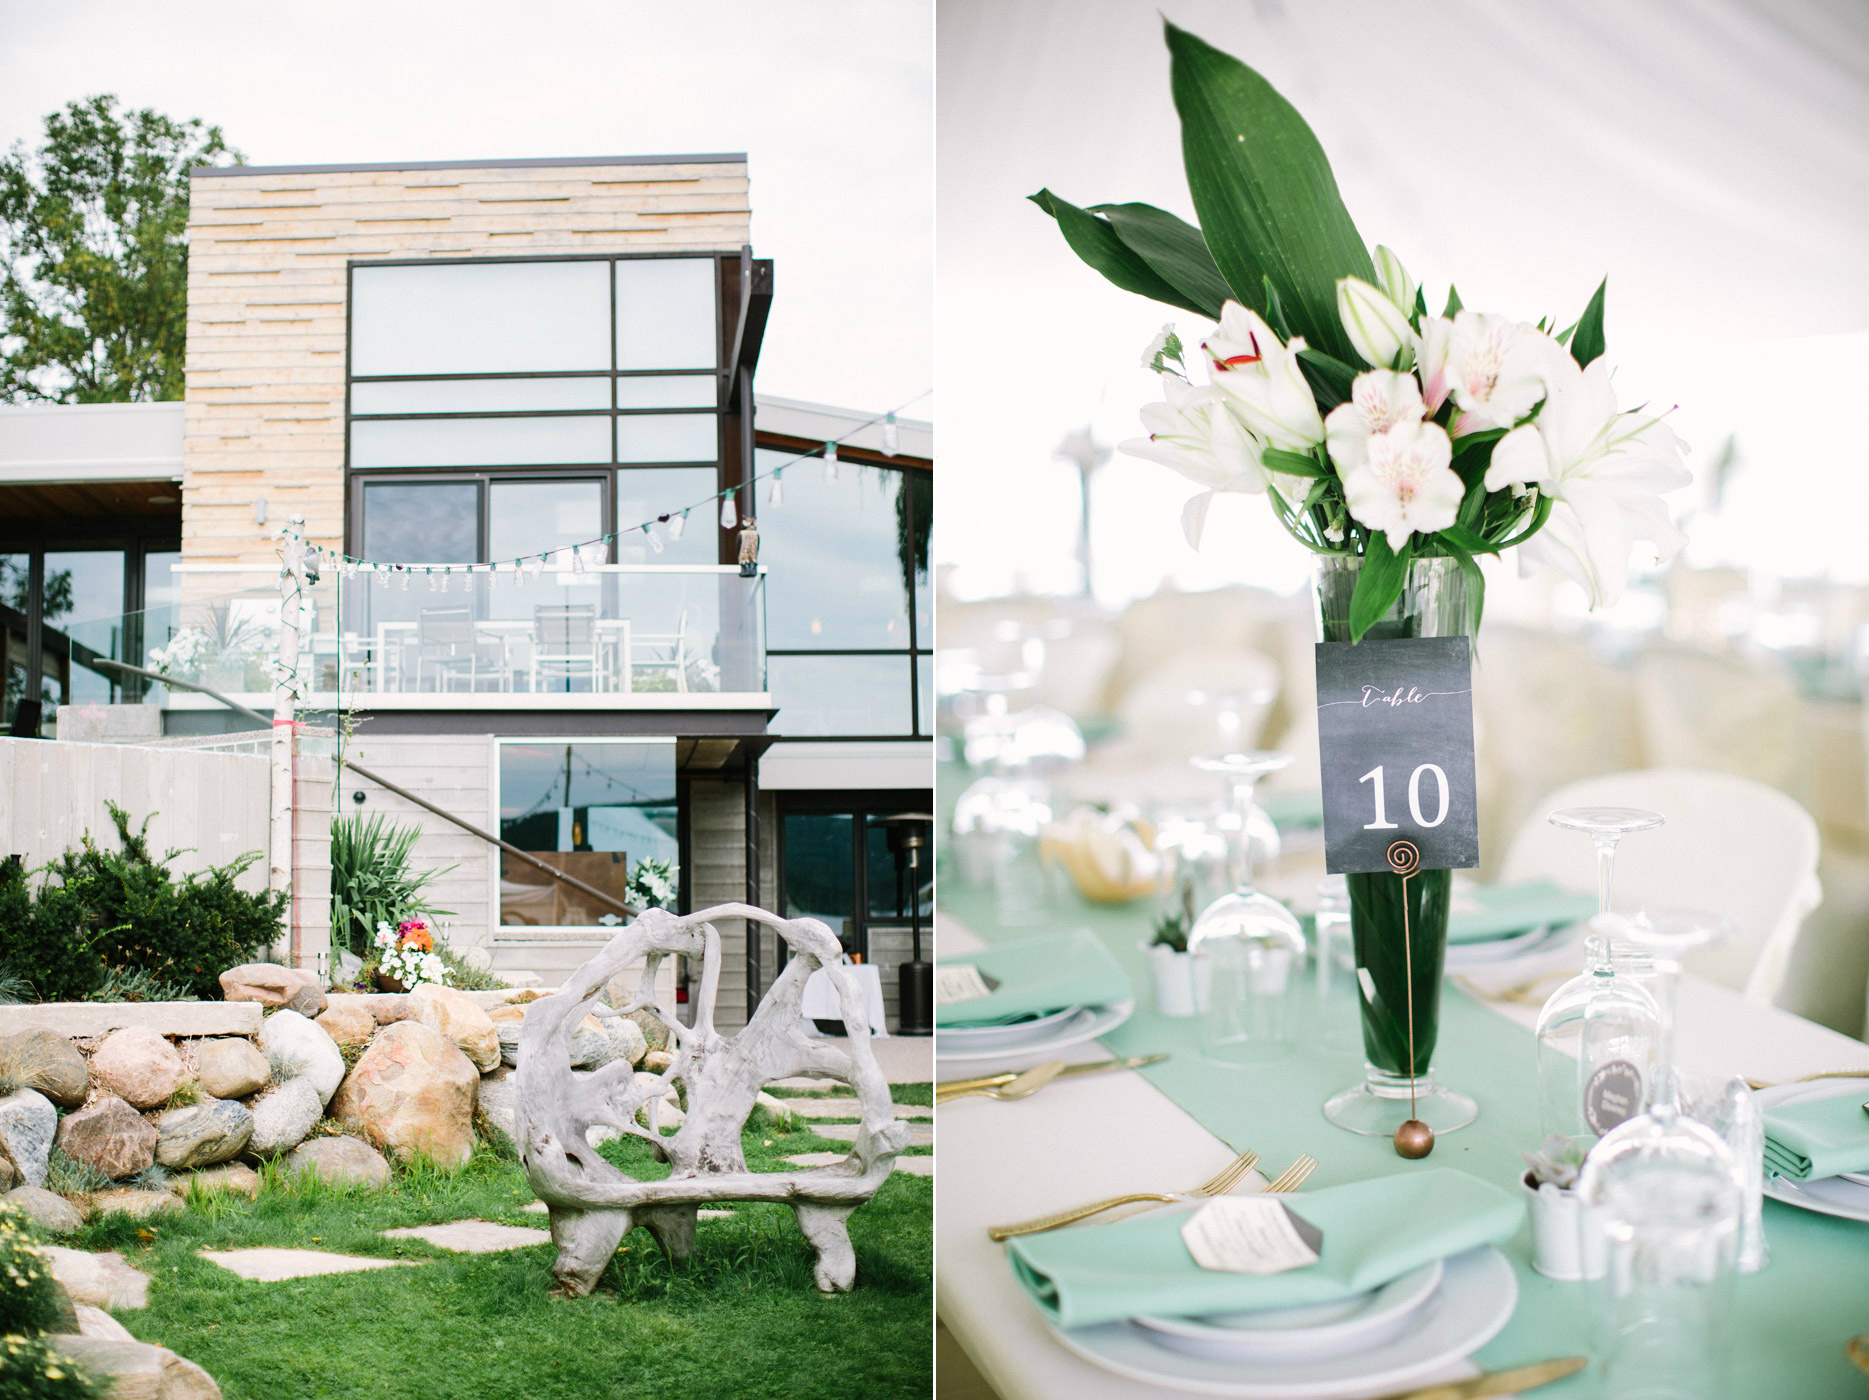 Backyard_collingwood_waterfront_diy_wedding1.jpg